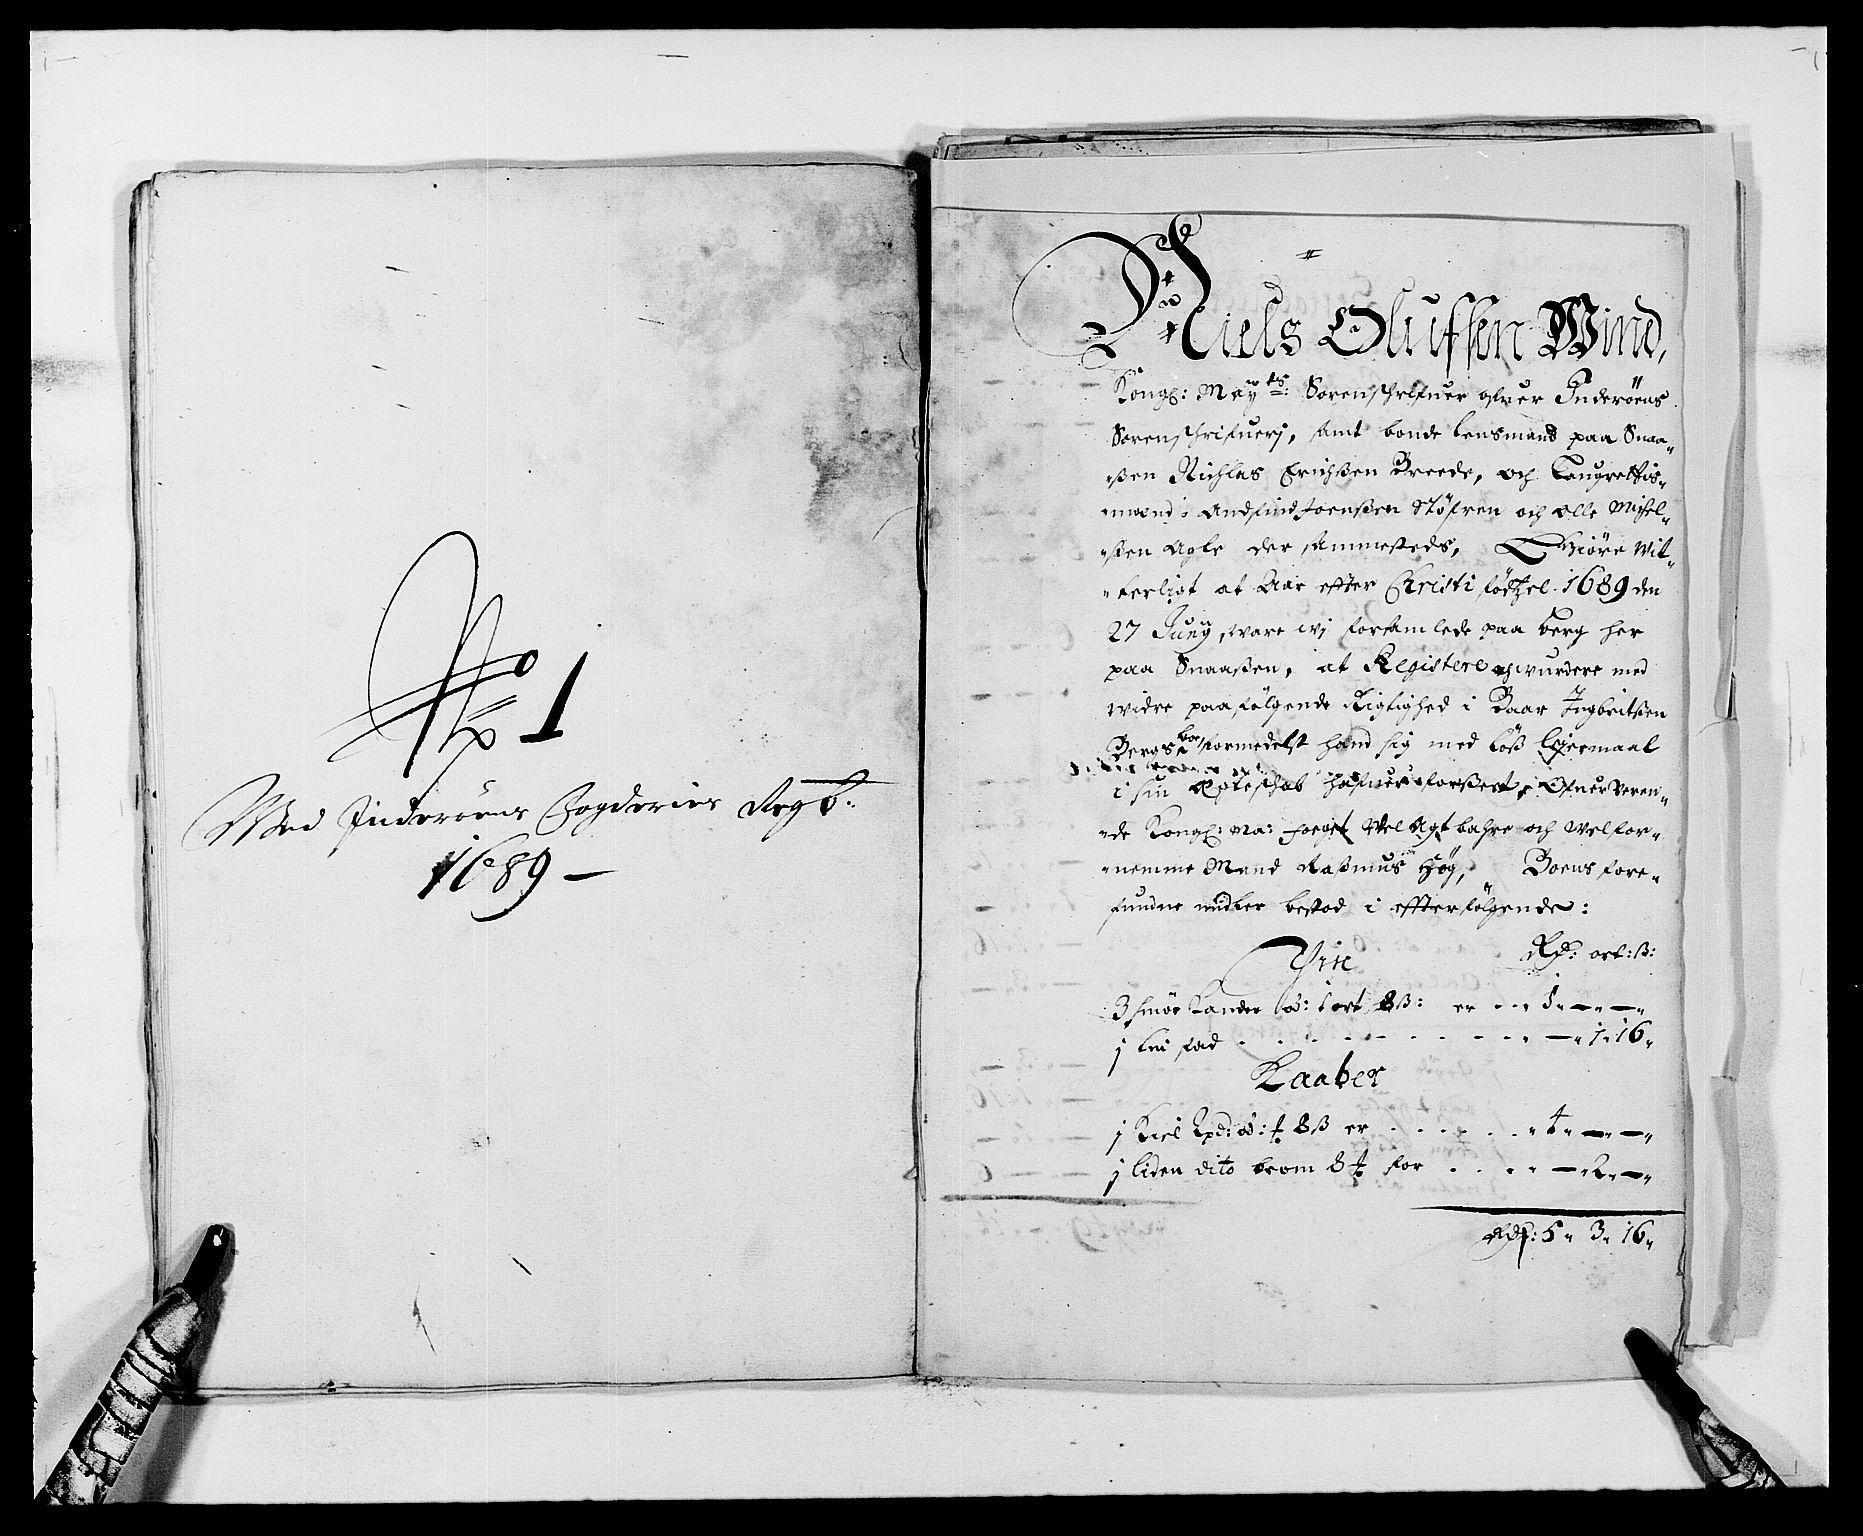 RA, Rentekammeret inntil 1814, Reviderte regnskaper, Fogderegnskap, R63/L4306: Fogderegnskap Inderøy, 1687-1689, s. 503